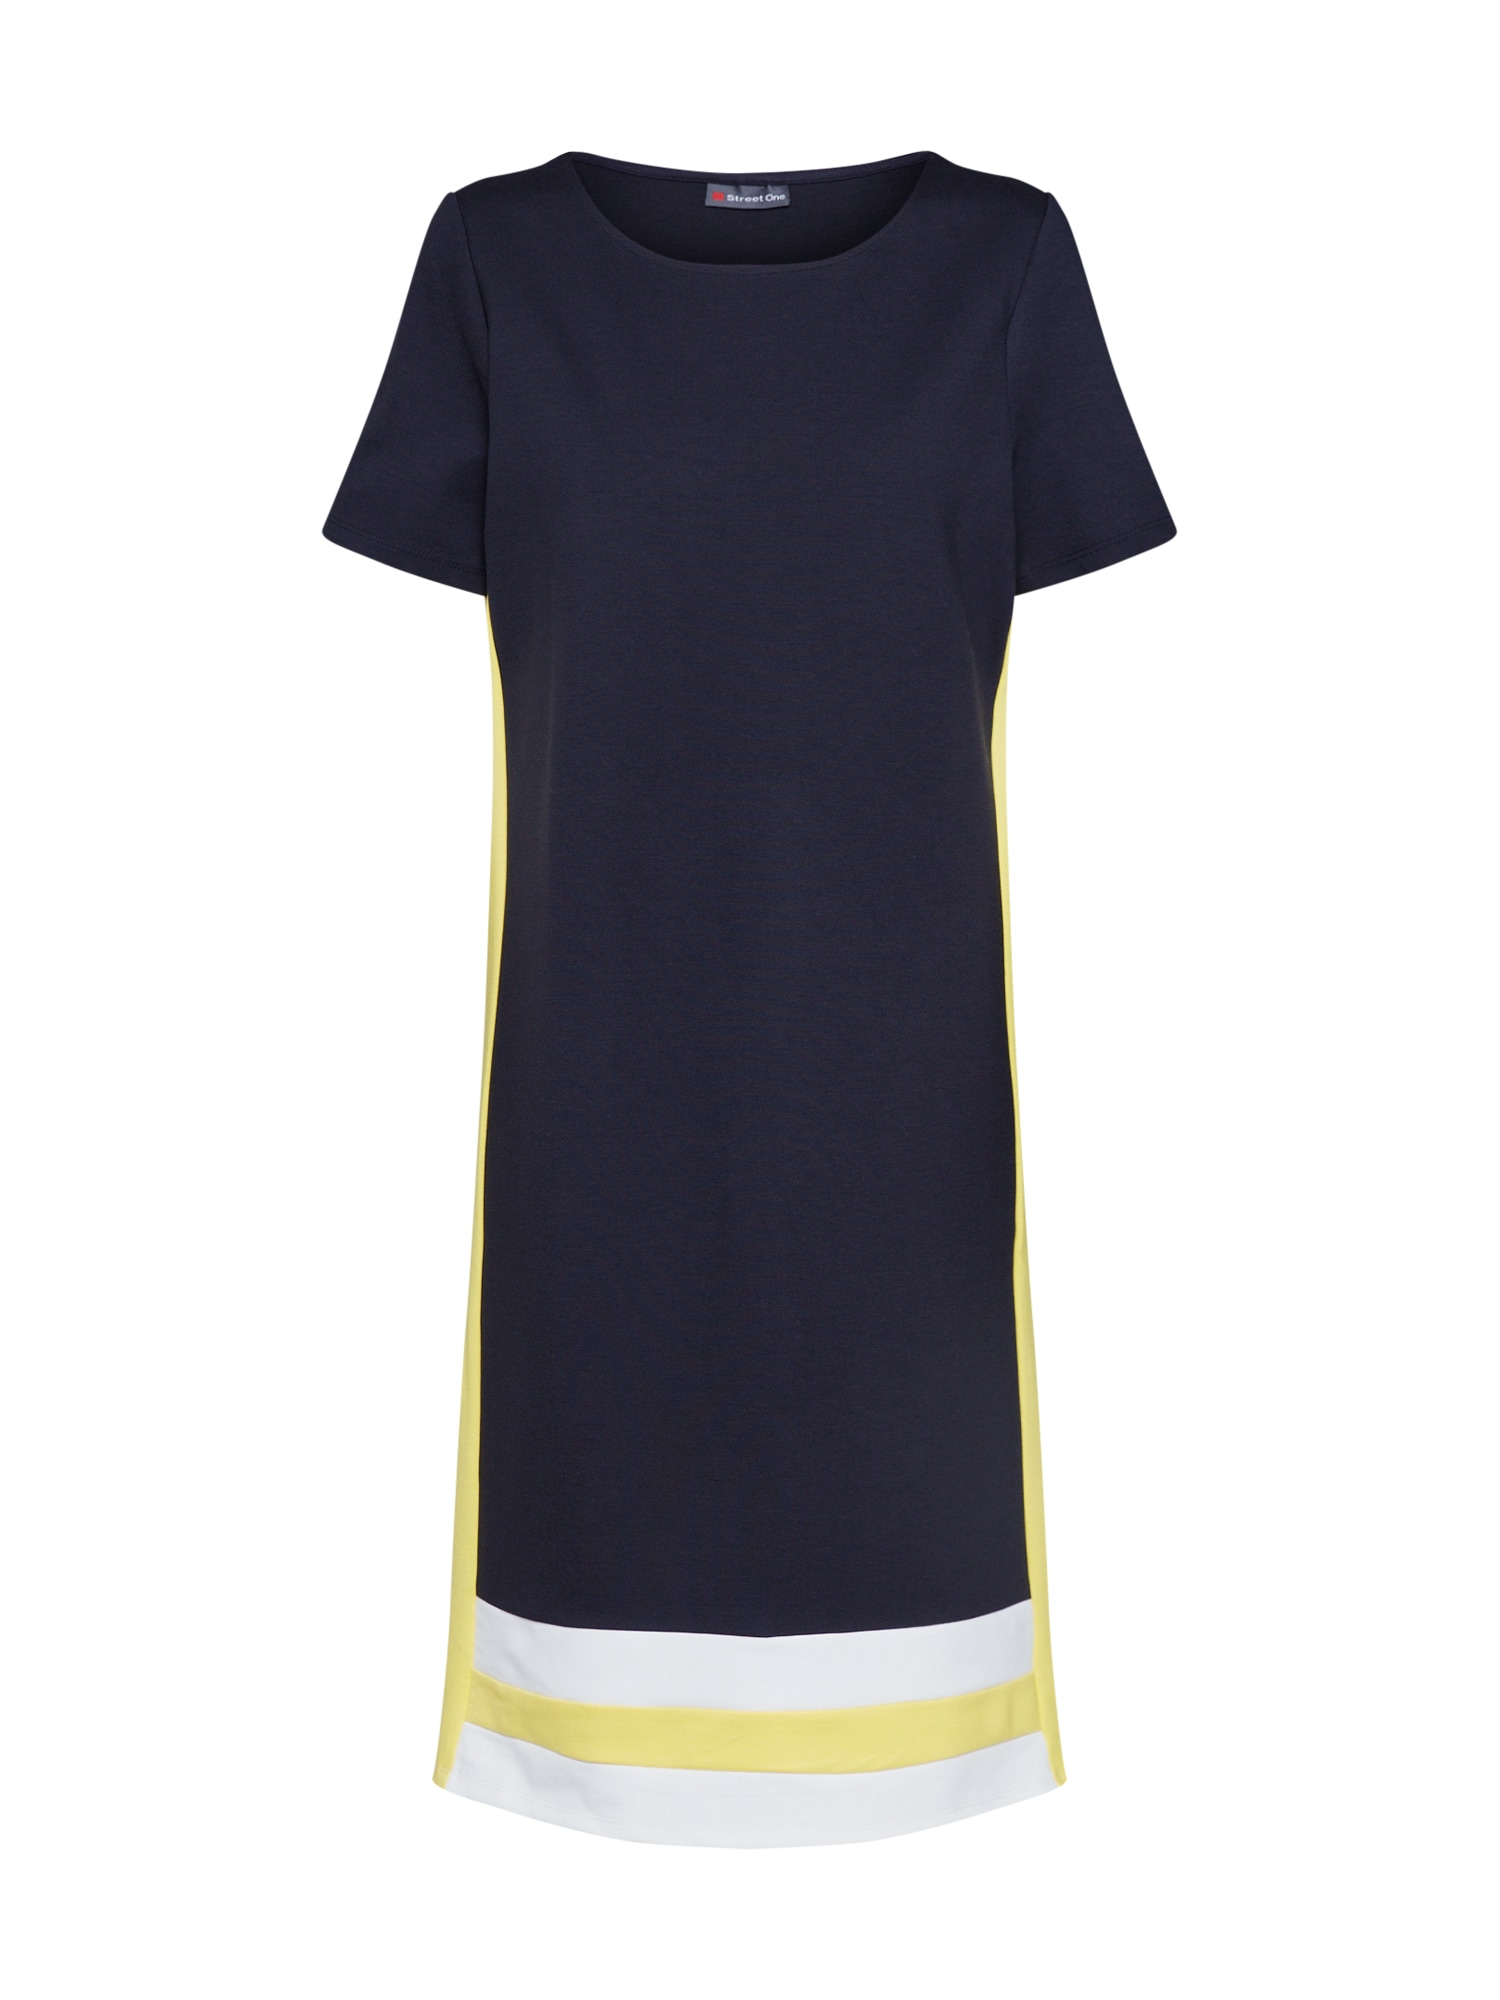 Šaty námořnická modř žlutá bílá STREET ONE